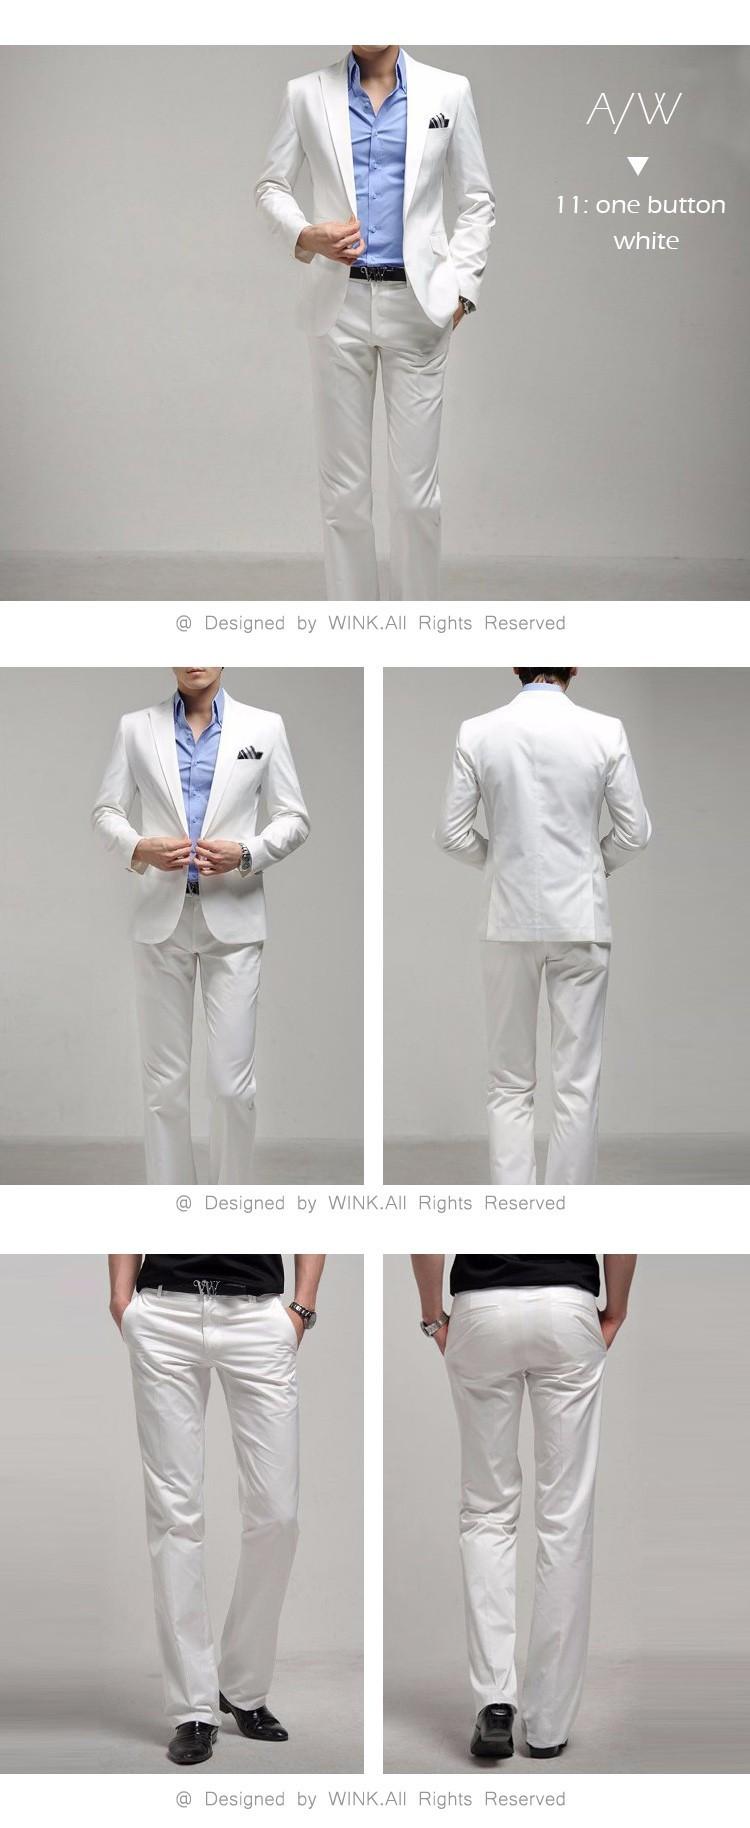 HTB1JtD5LVXXXXcTXpXXq6xXFXXXT - (Jacket+Pant+Tie) Men Wedding Suit Sets Tuxedo Formal Fashion Slim Fit Business Dress Suits Blazer Brand Party Masculino Suits